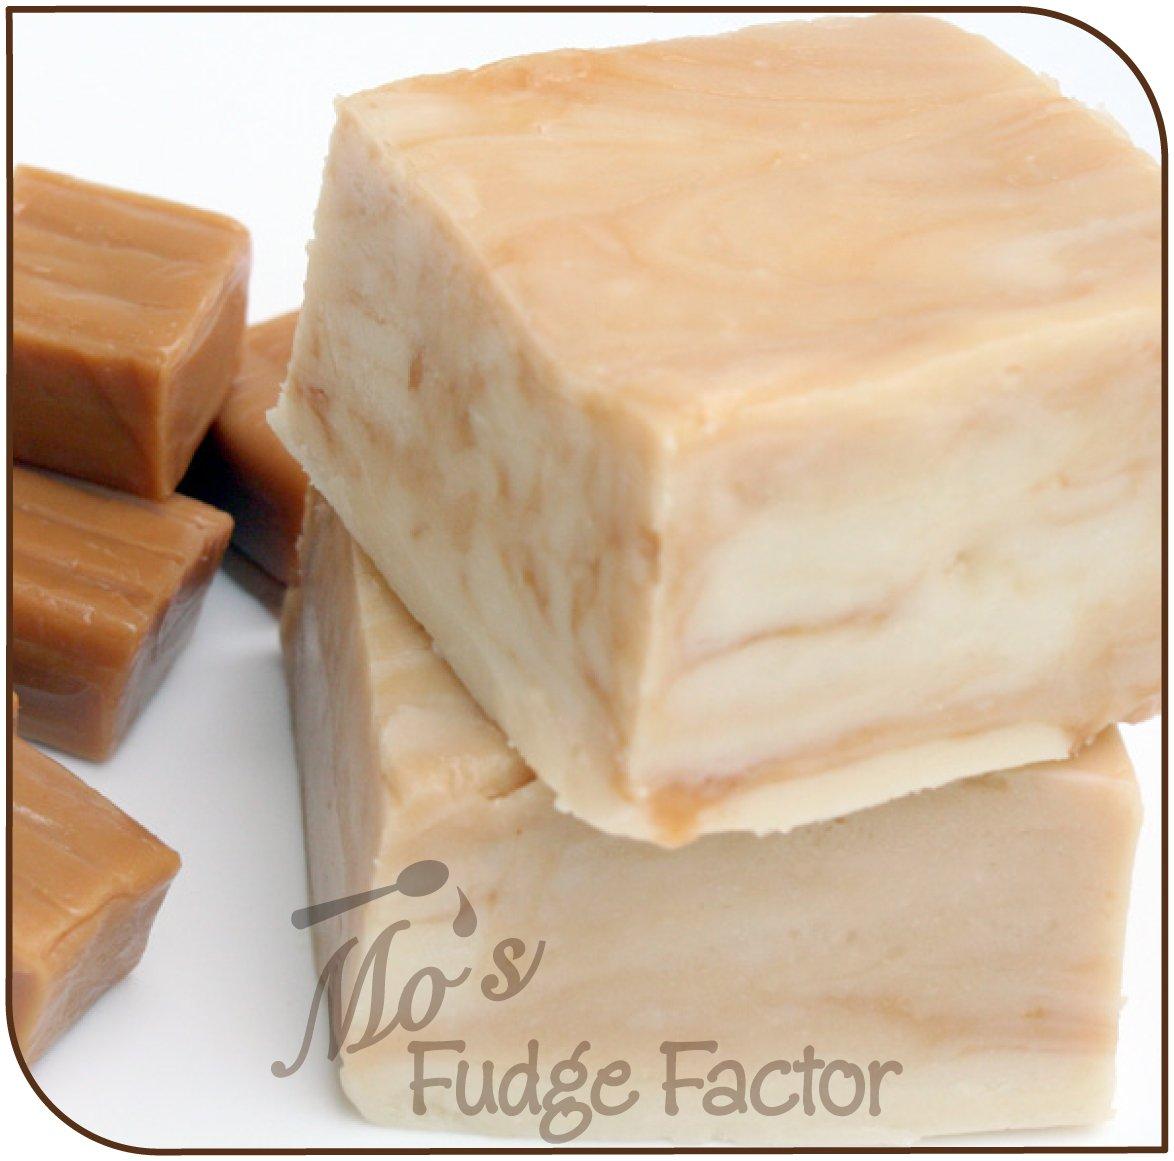 Mo's Fudge Factor, Vanilla Caramel Swirl Fudge 2 pounds